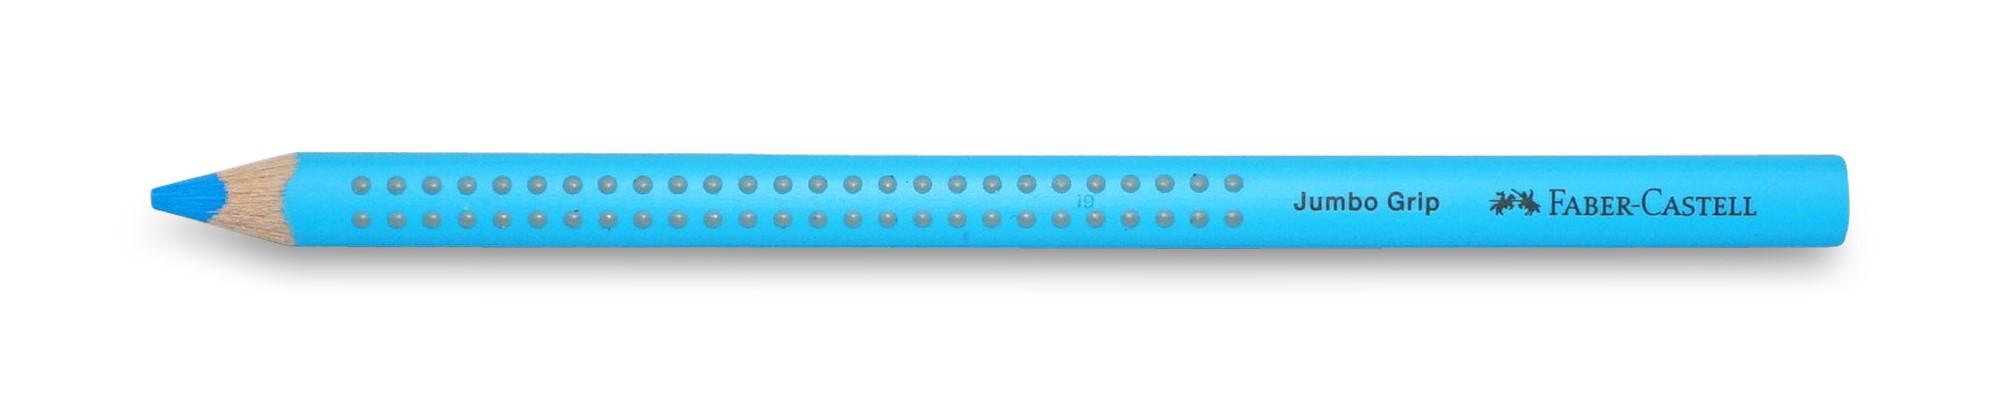 Faber-Castell Jumbo Grip Buntstifte, Einzelfarben